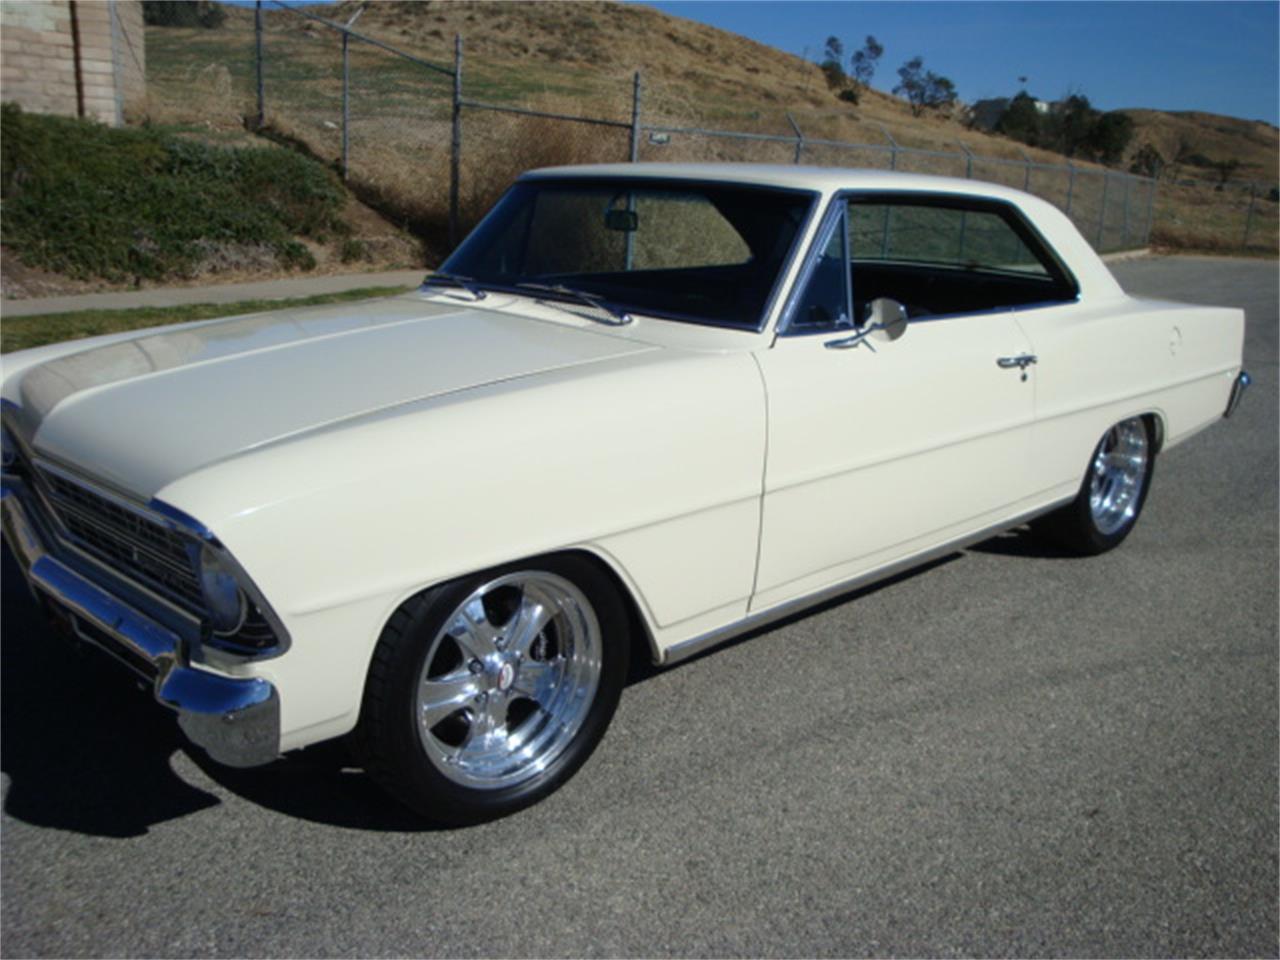 Large Picture of Classic '67 Chevrolet Nova located in California - $68,800.00 - MUON